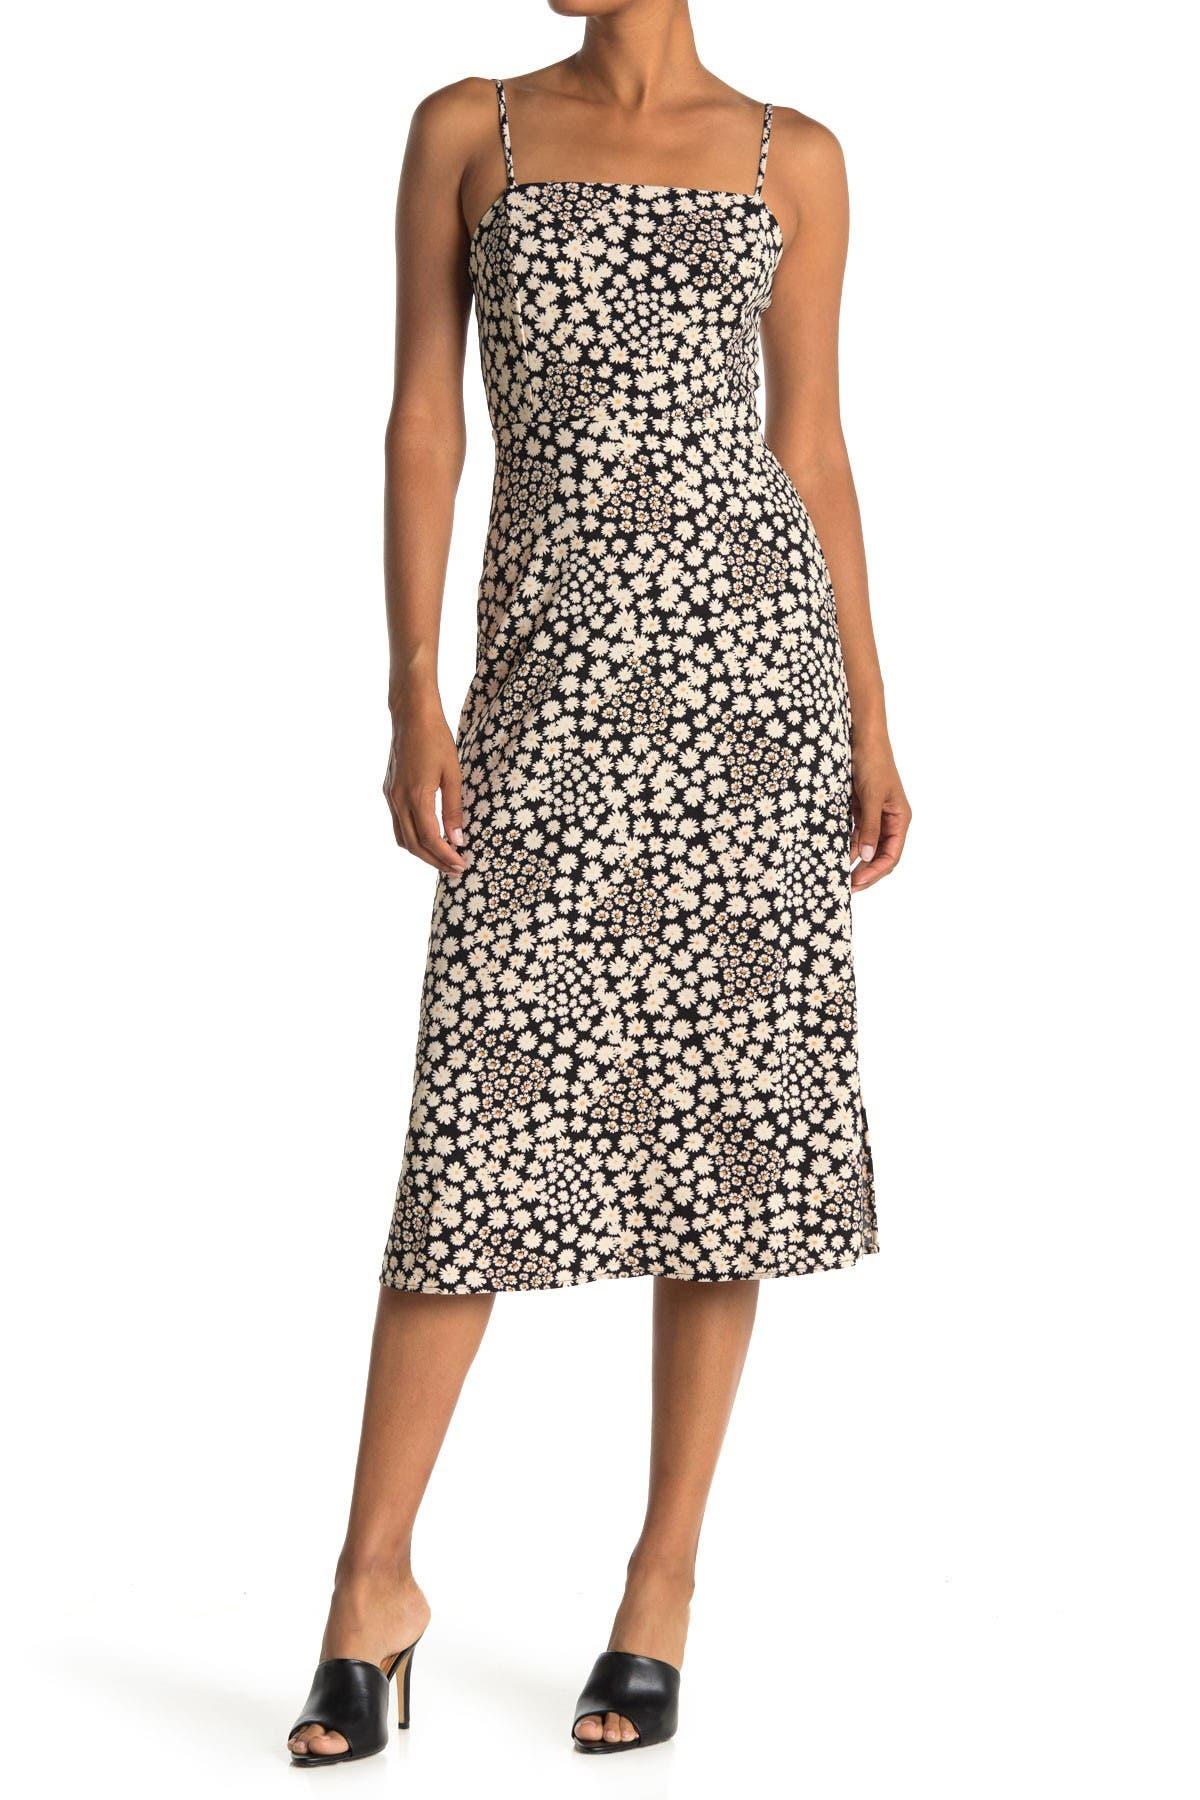 Image of Lush Floral Cami Midi Dress